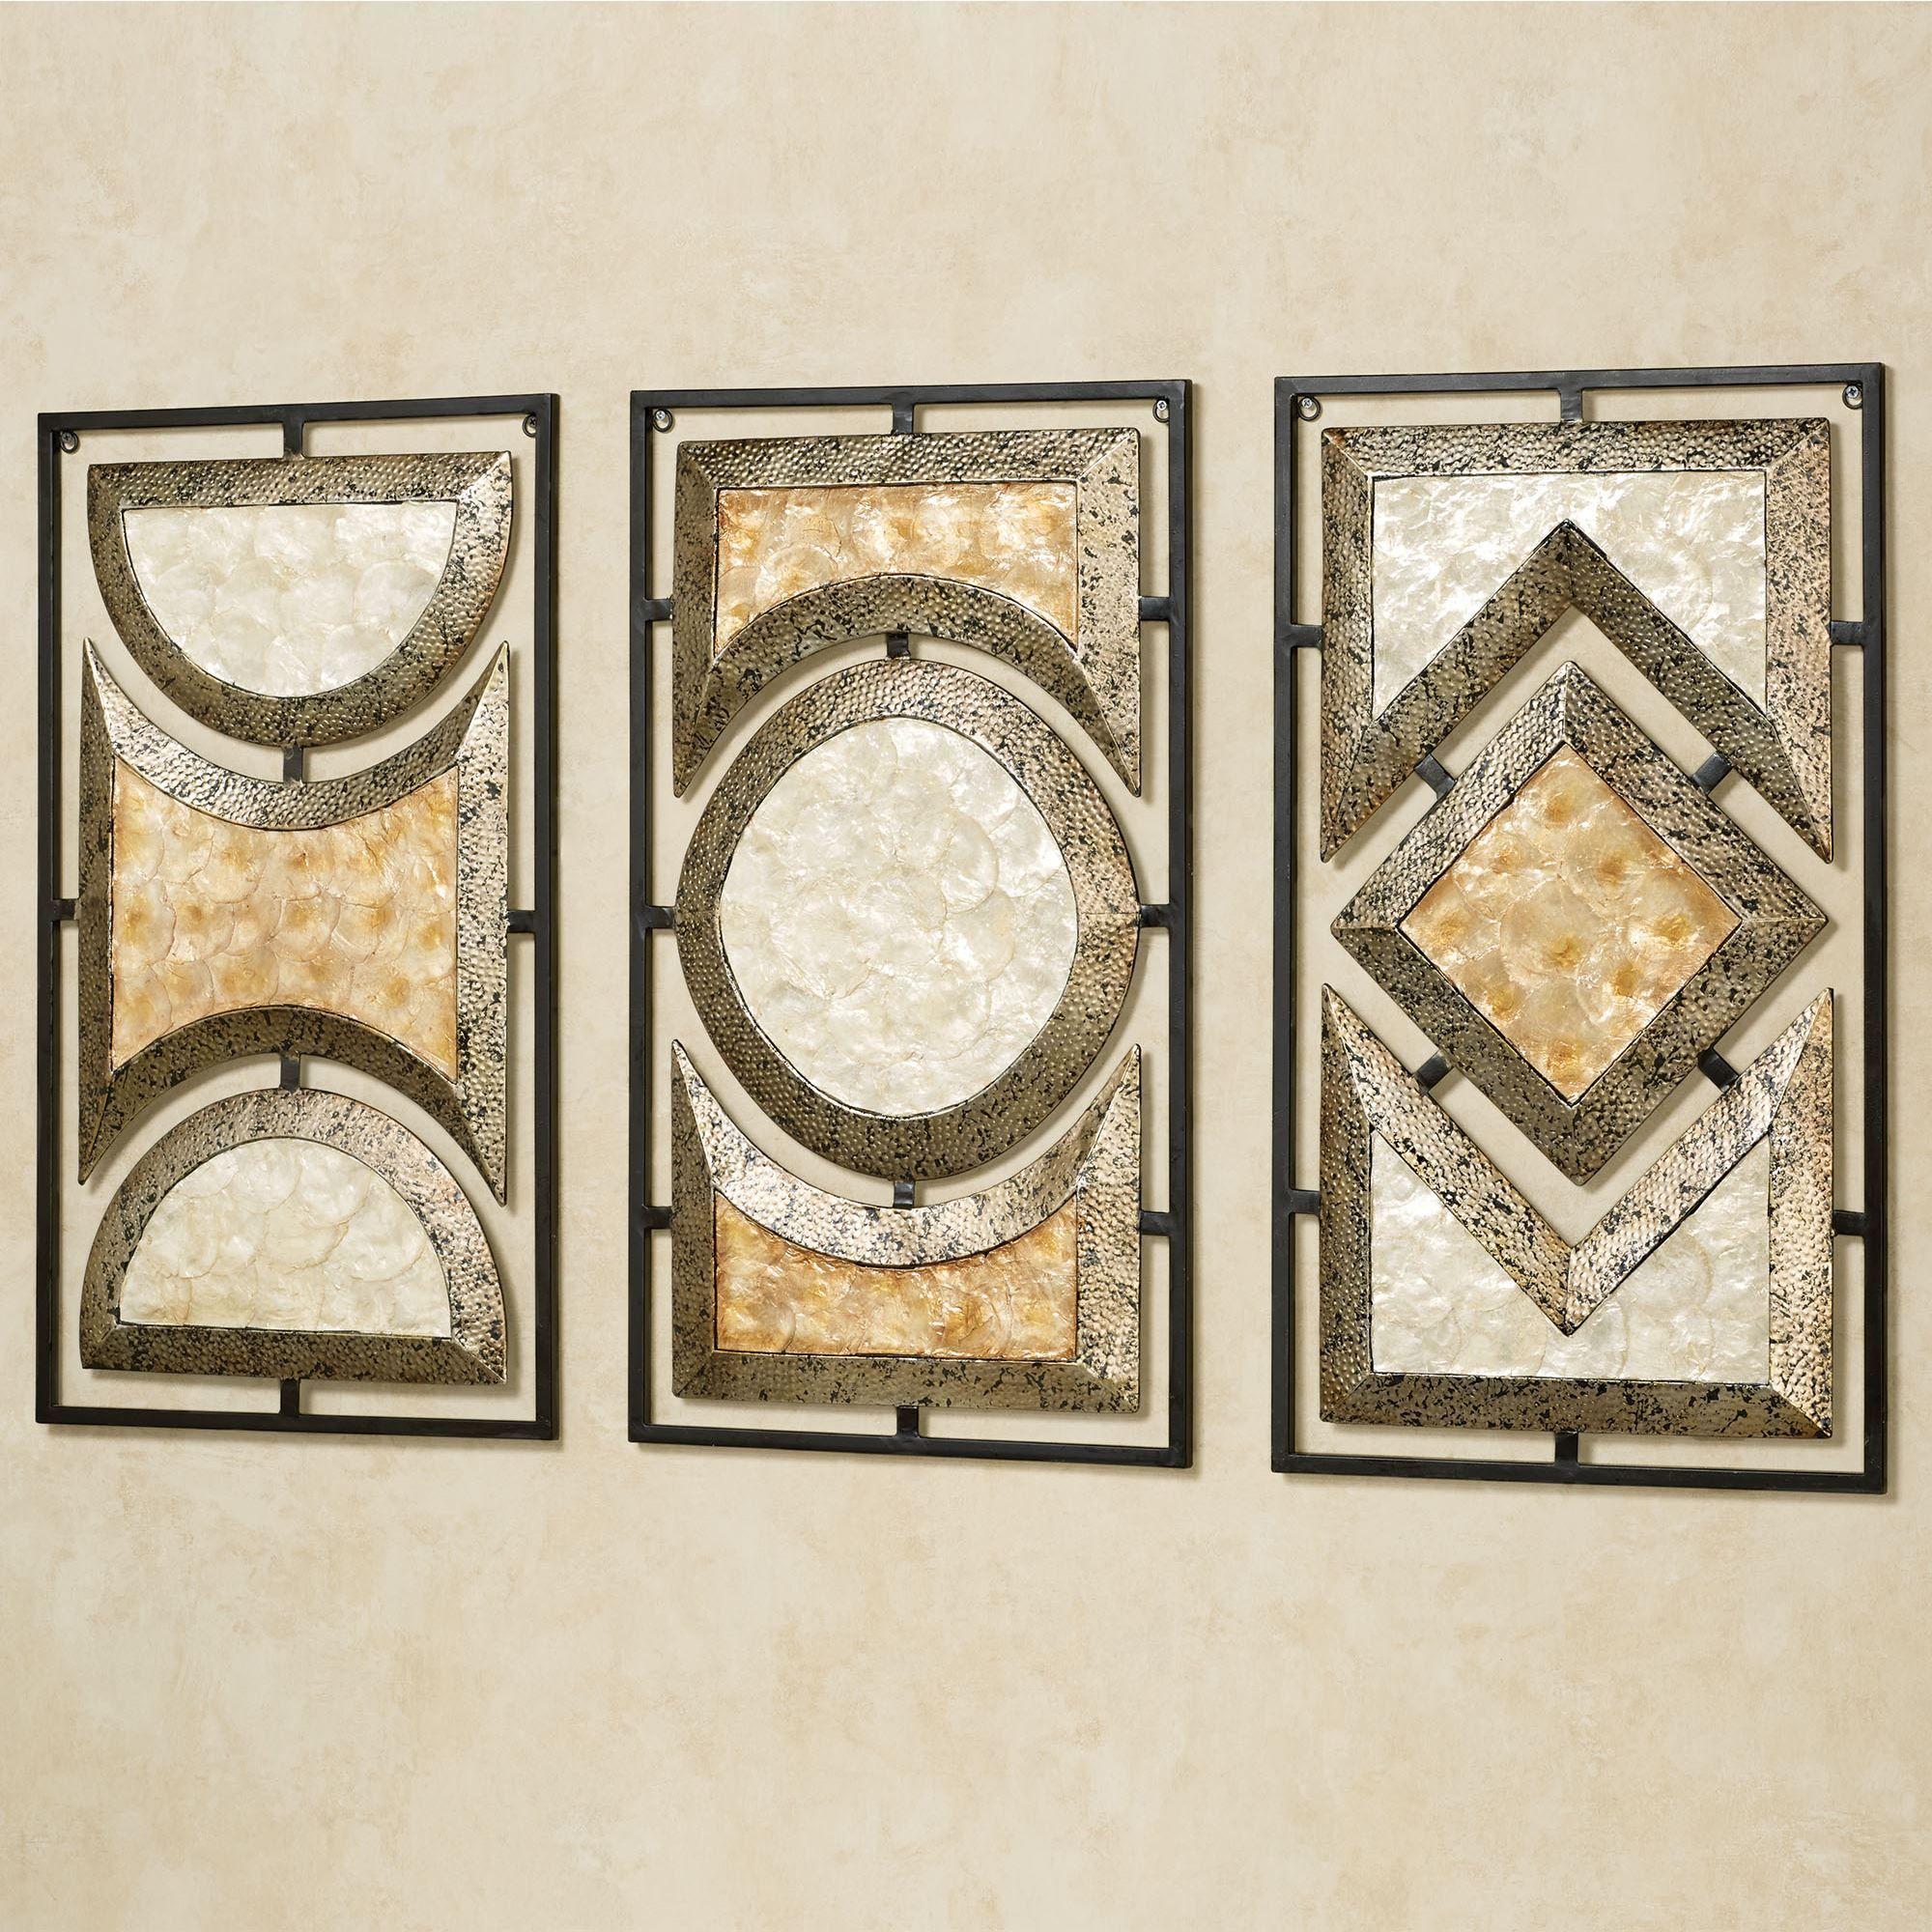 Pasquale Capiz Shell Metal Wall Art Set